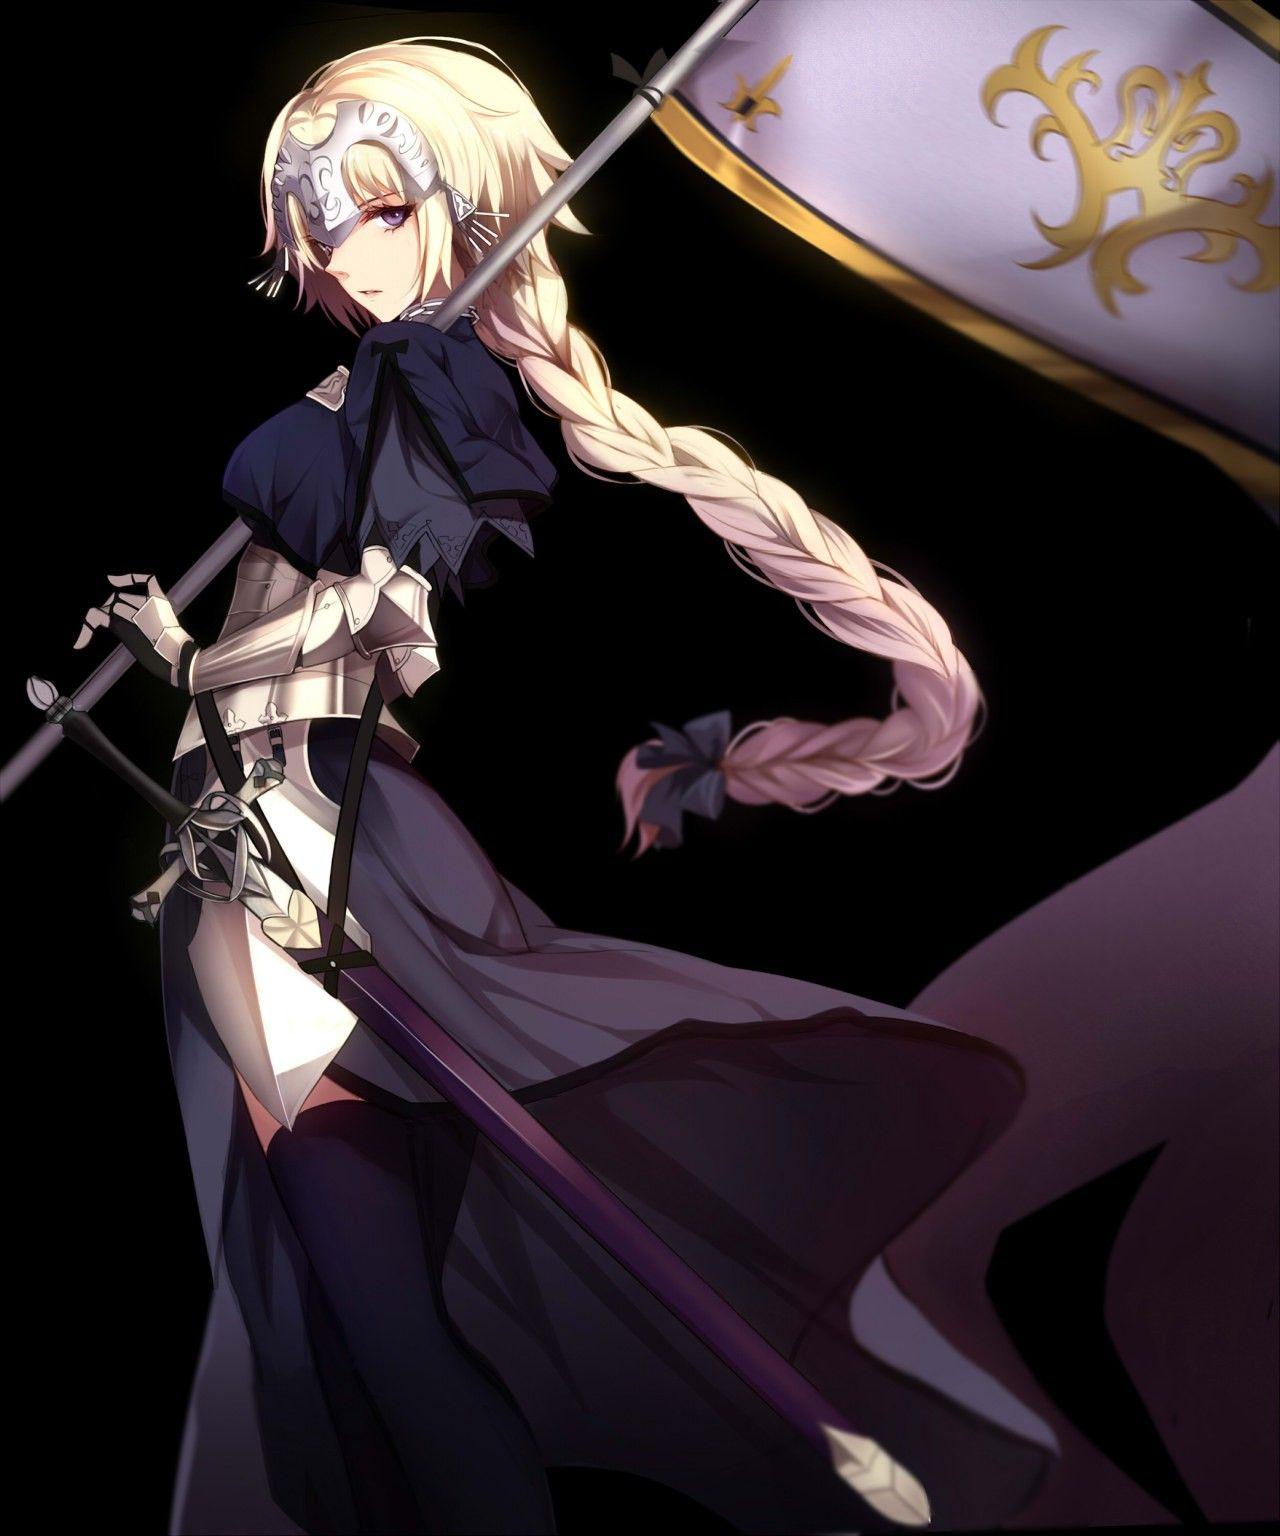 Pin by E.D. Jimenez on Fate Joan of arc fate, Fate anime